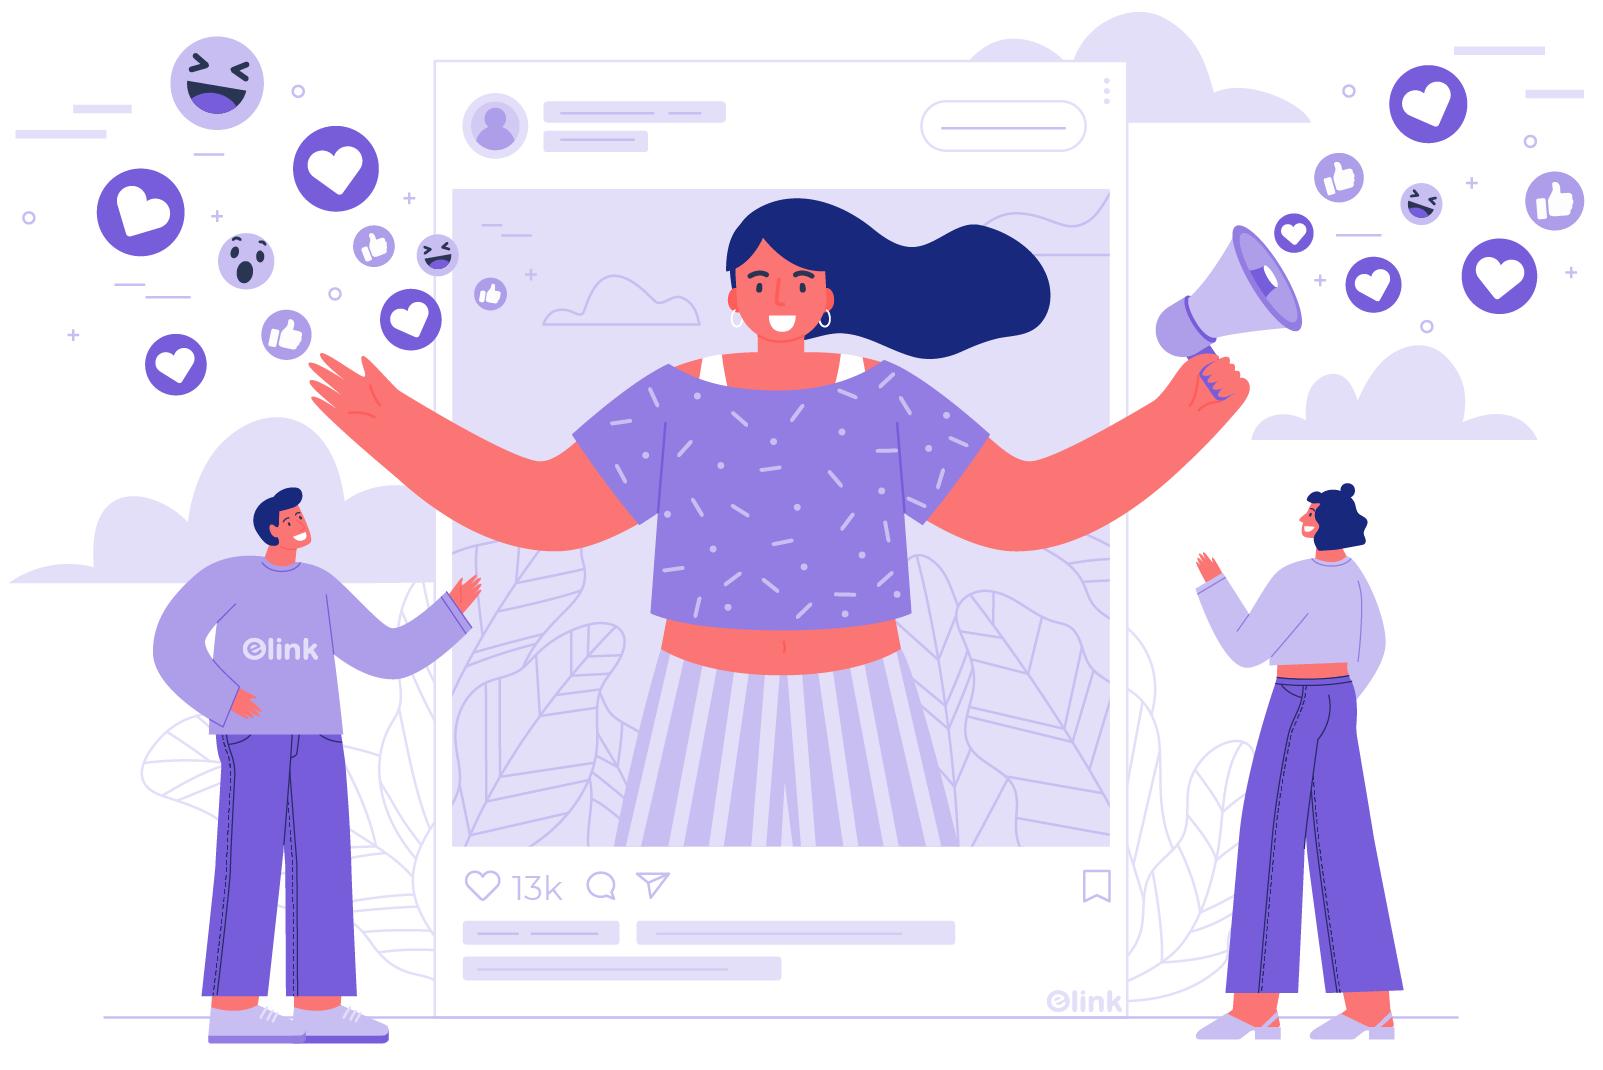 Instagram marketing as a small business idea